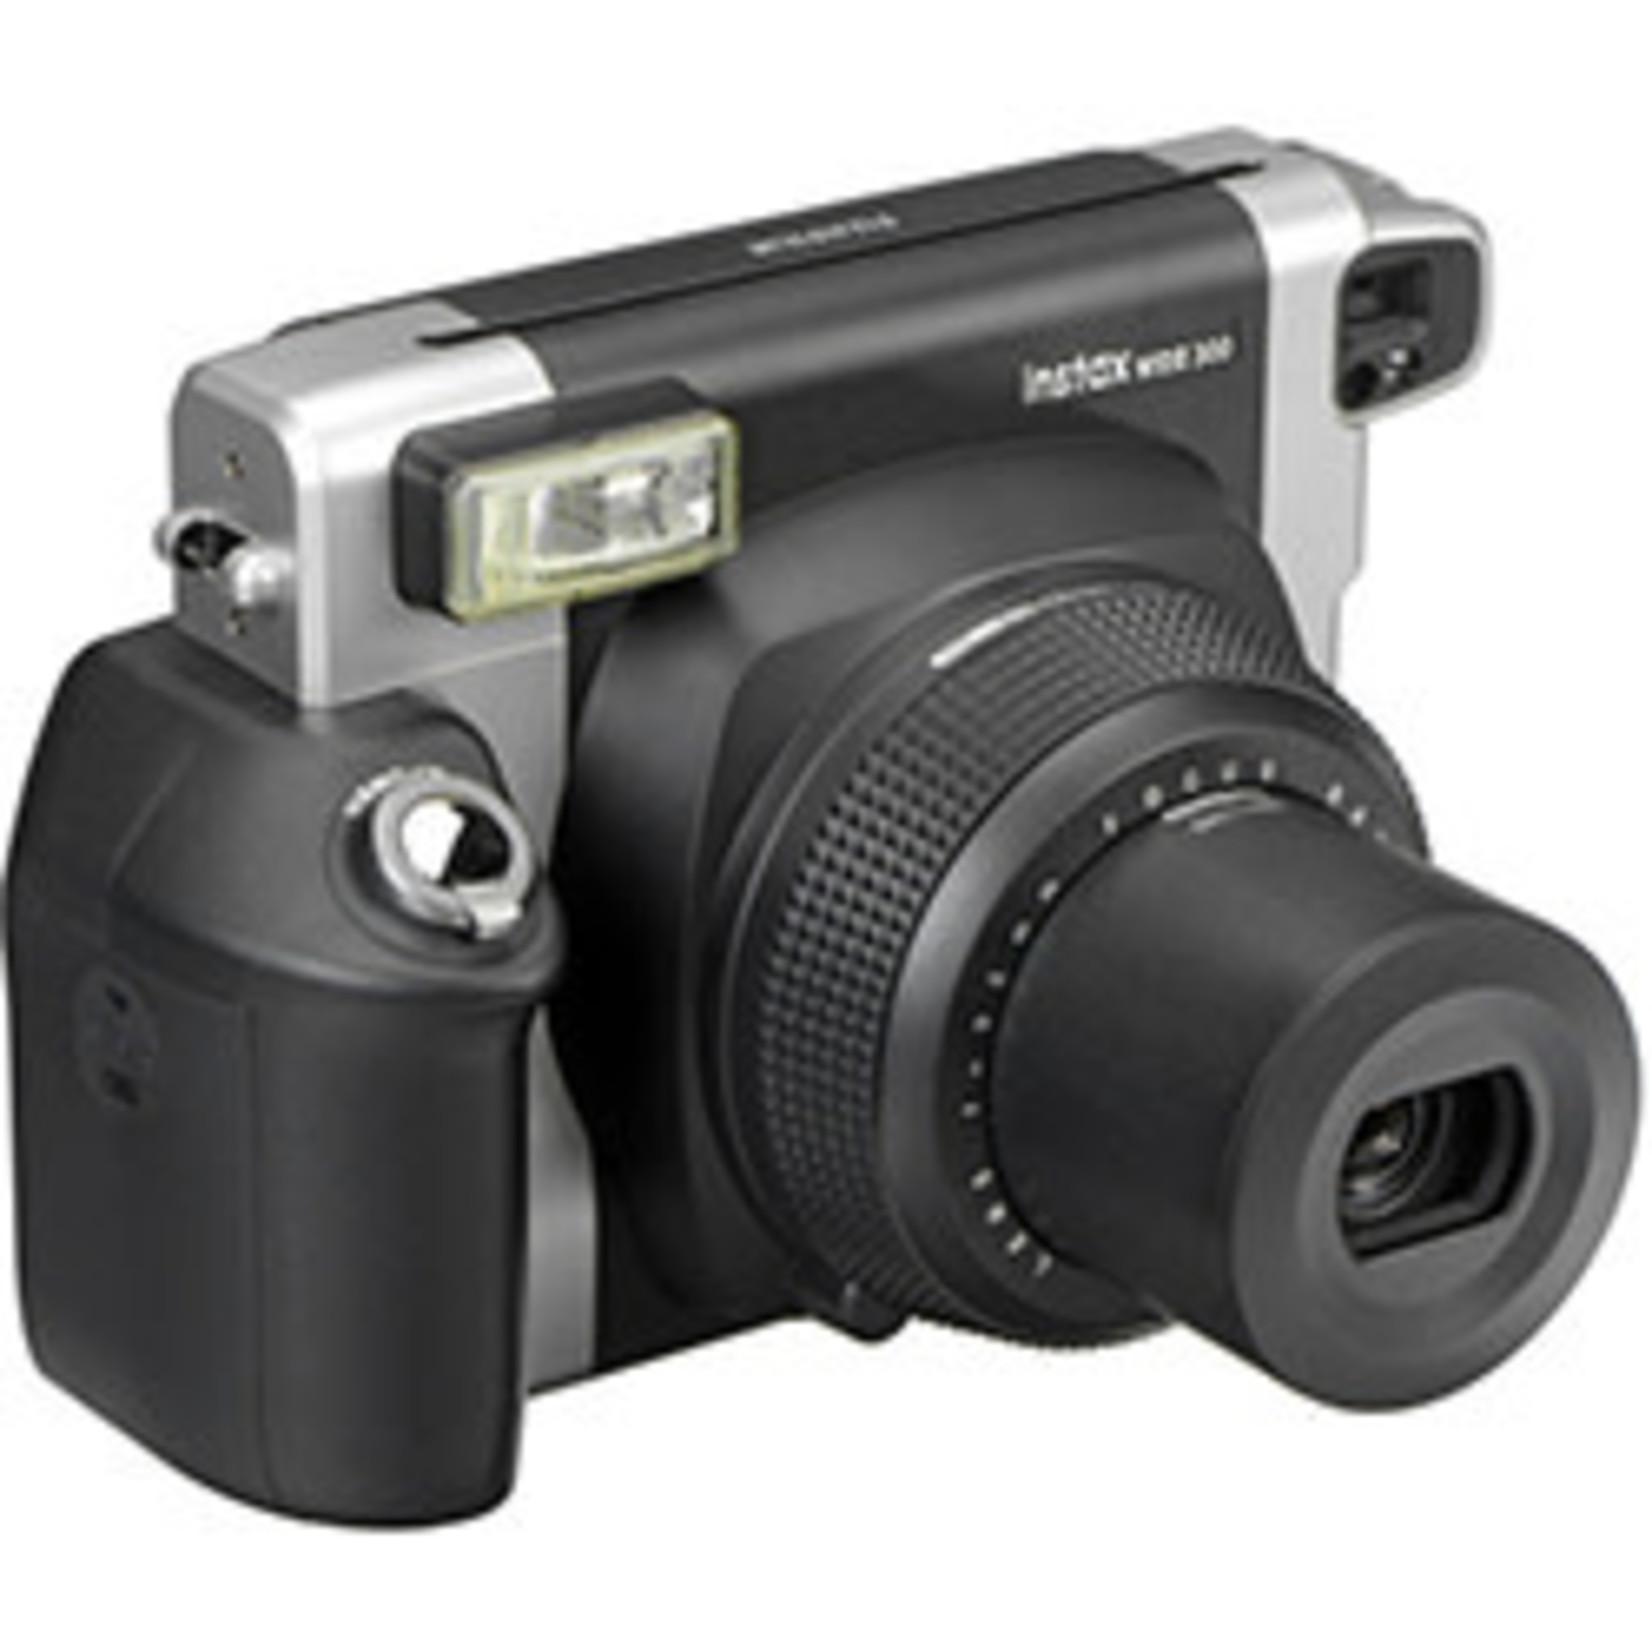 FujiFilm Fujifilm Instax Wide 300 Instant Camera